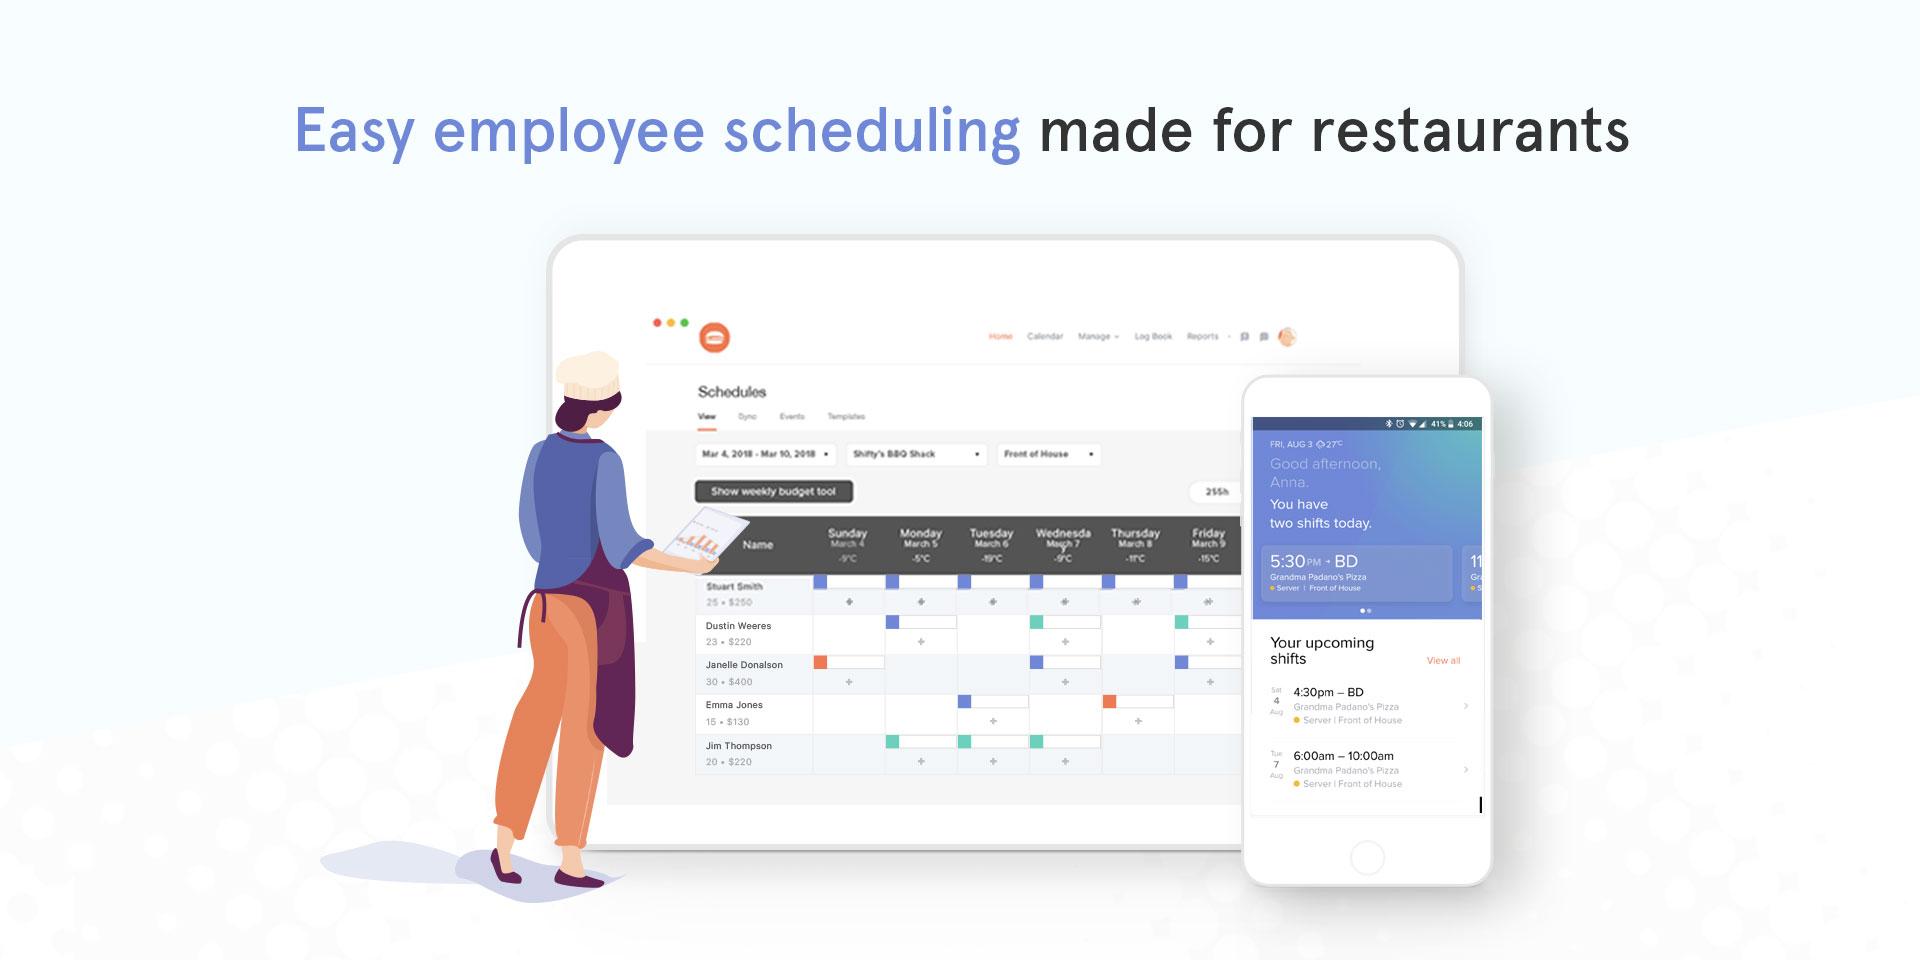 7shifts Restaurant Scheduling Demo - Easy employee scheduling for restaurants